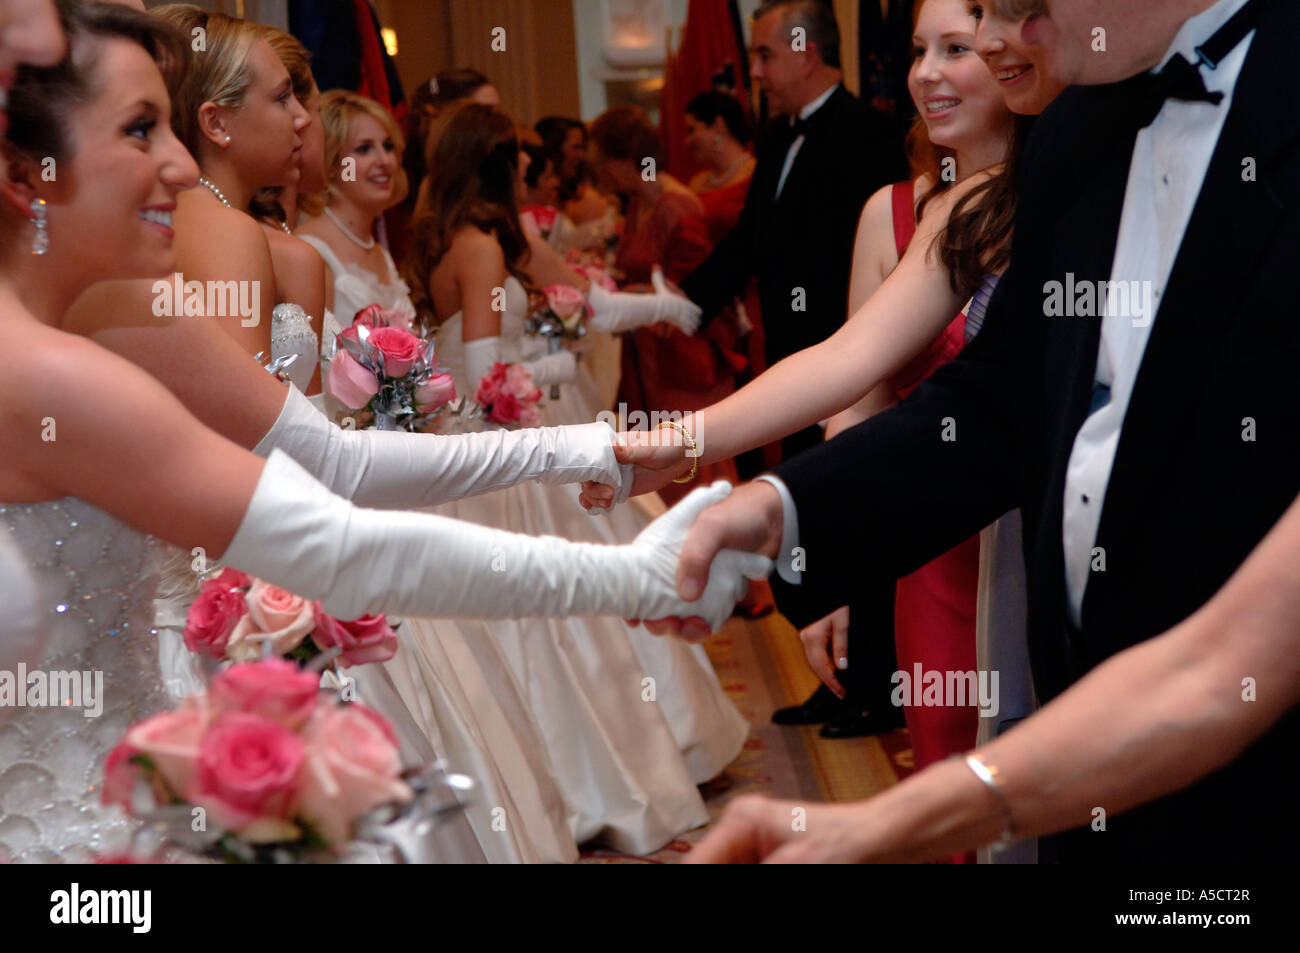 International Debutante Ball The receiving line at the 52nd International Debutante Ball at the Waldorf Astoria Hotel in NYC